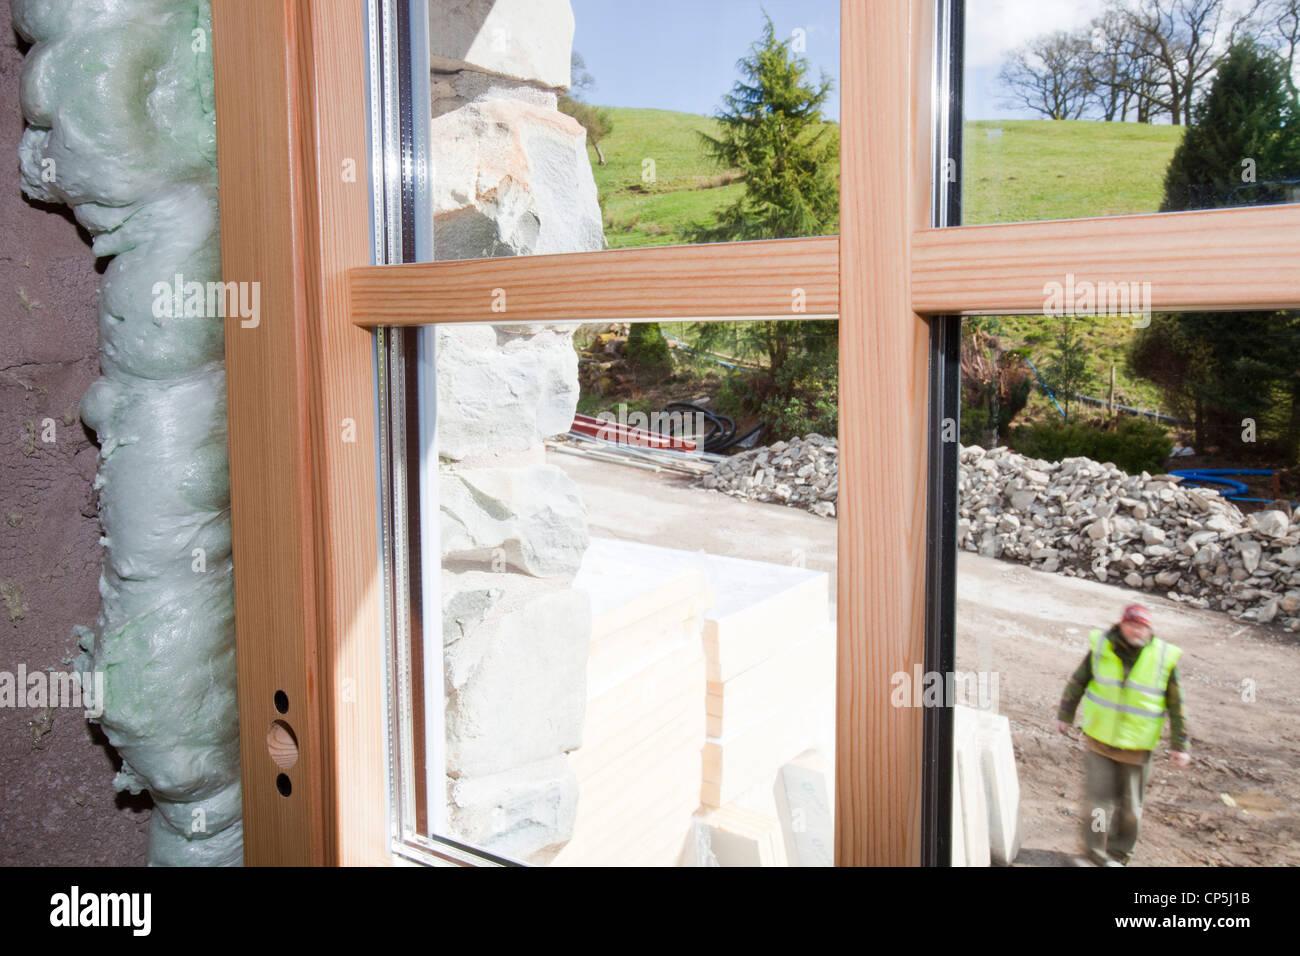 Dreifach verglaste Fenster in einem Passivhaus in Grayrigg, Kendal, UK. Stockbild